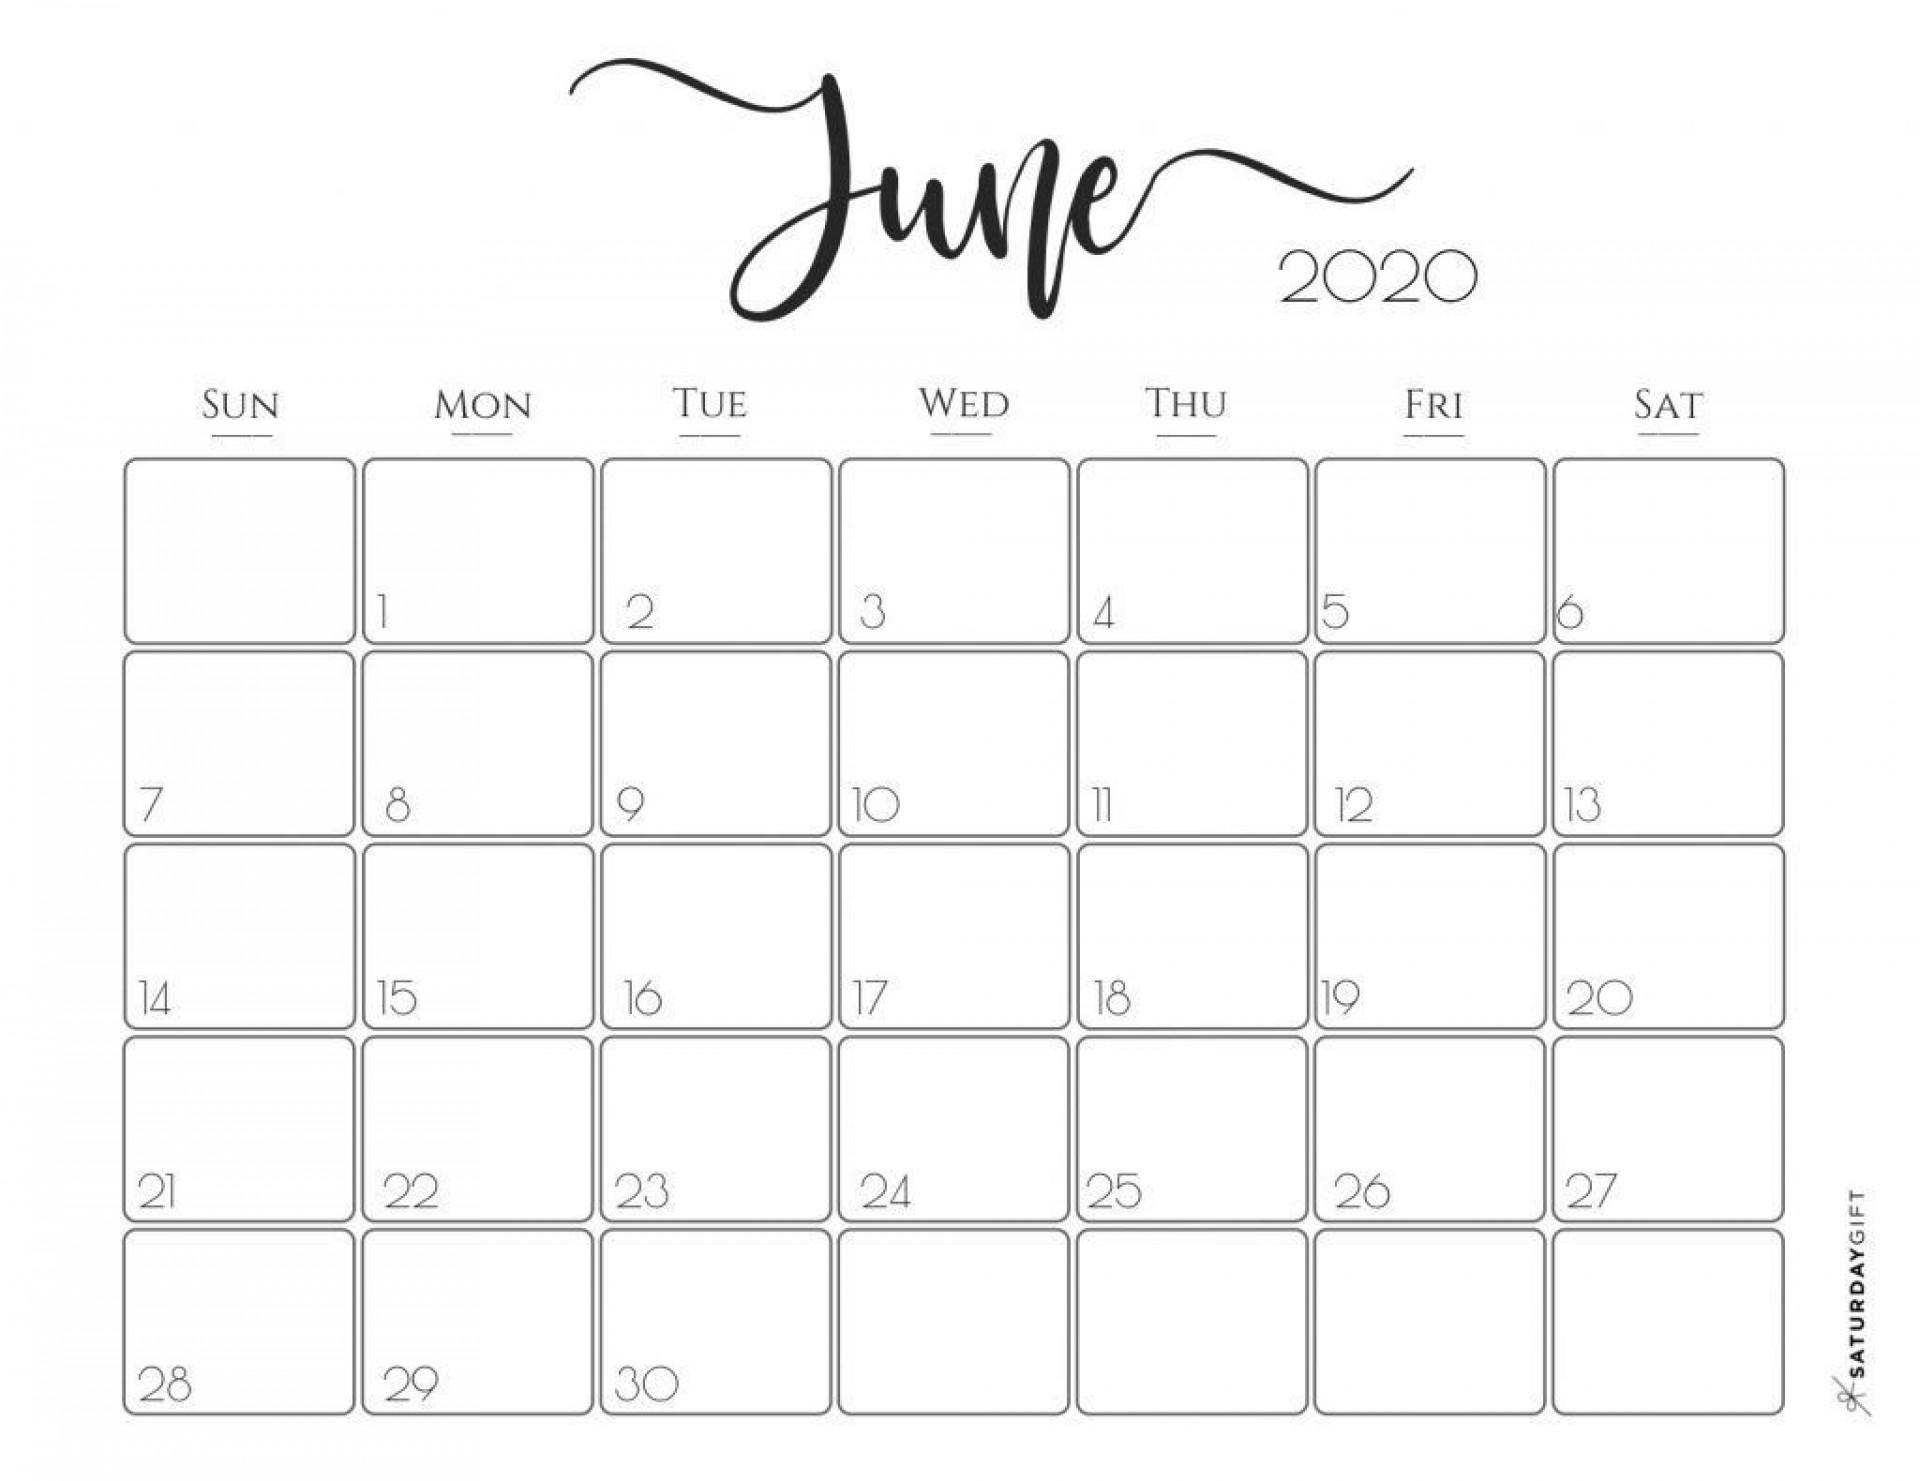 002 Best Printable Calendar Template June 2020 Inspiration  Free1920